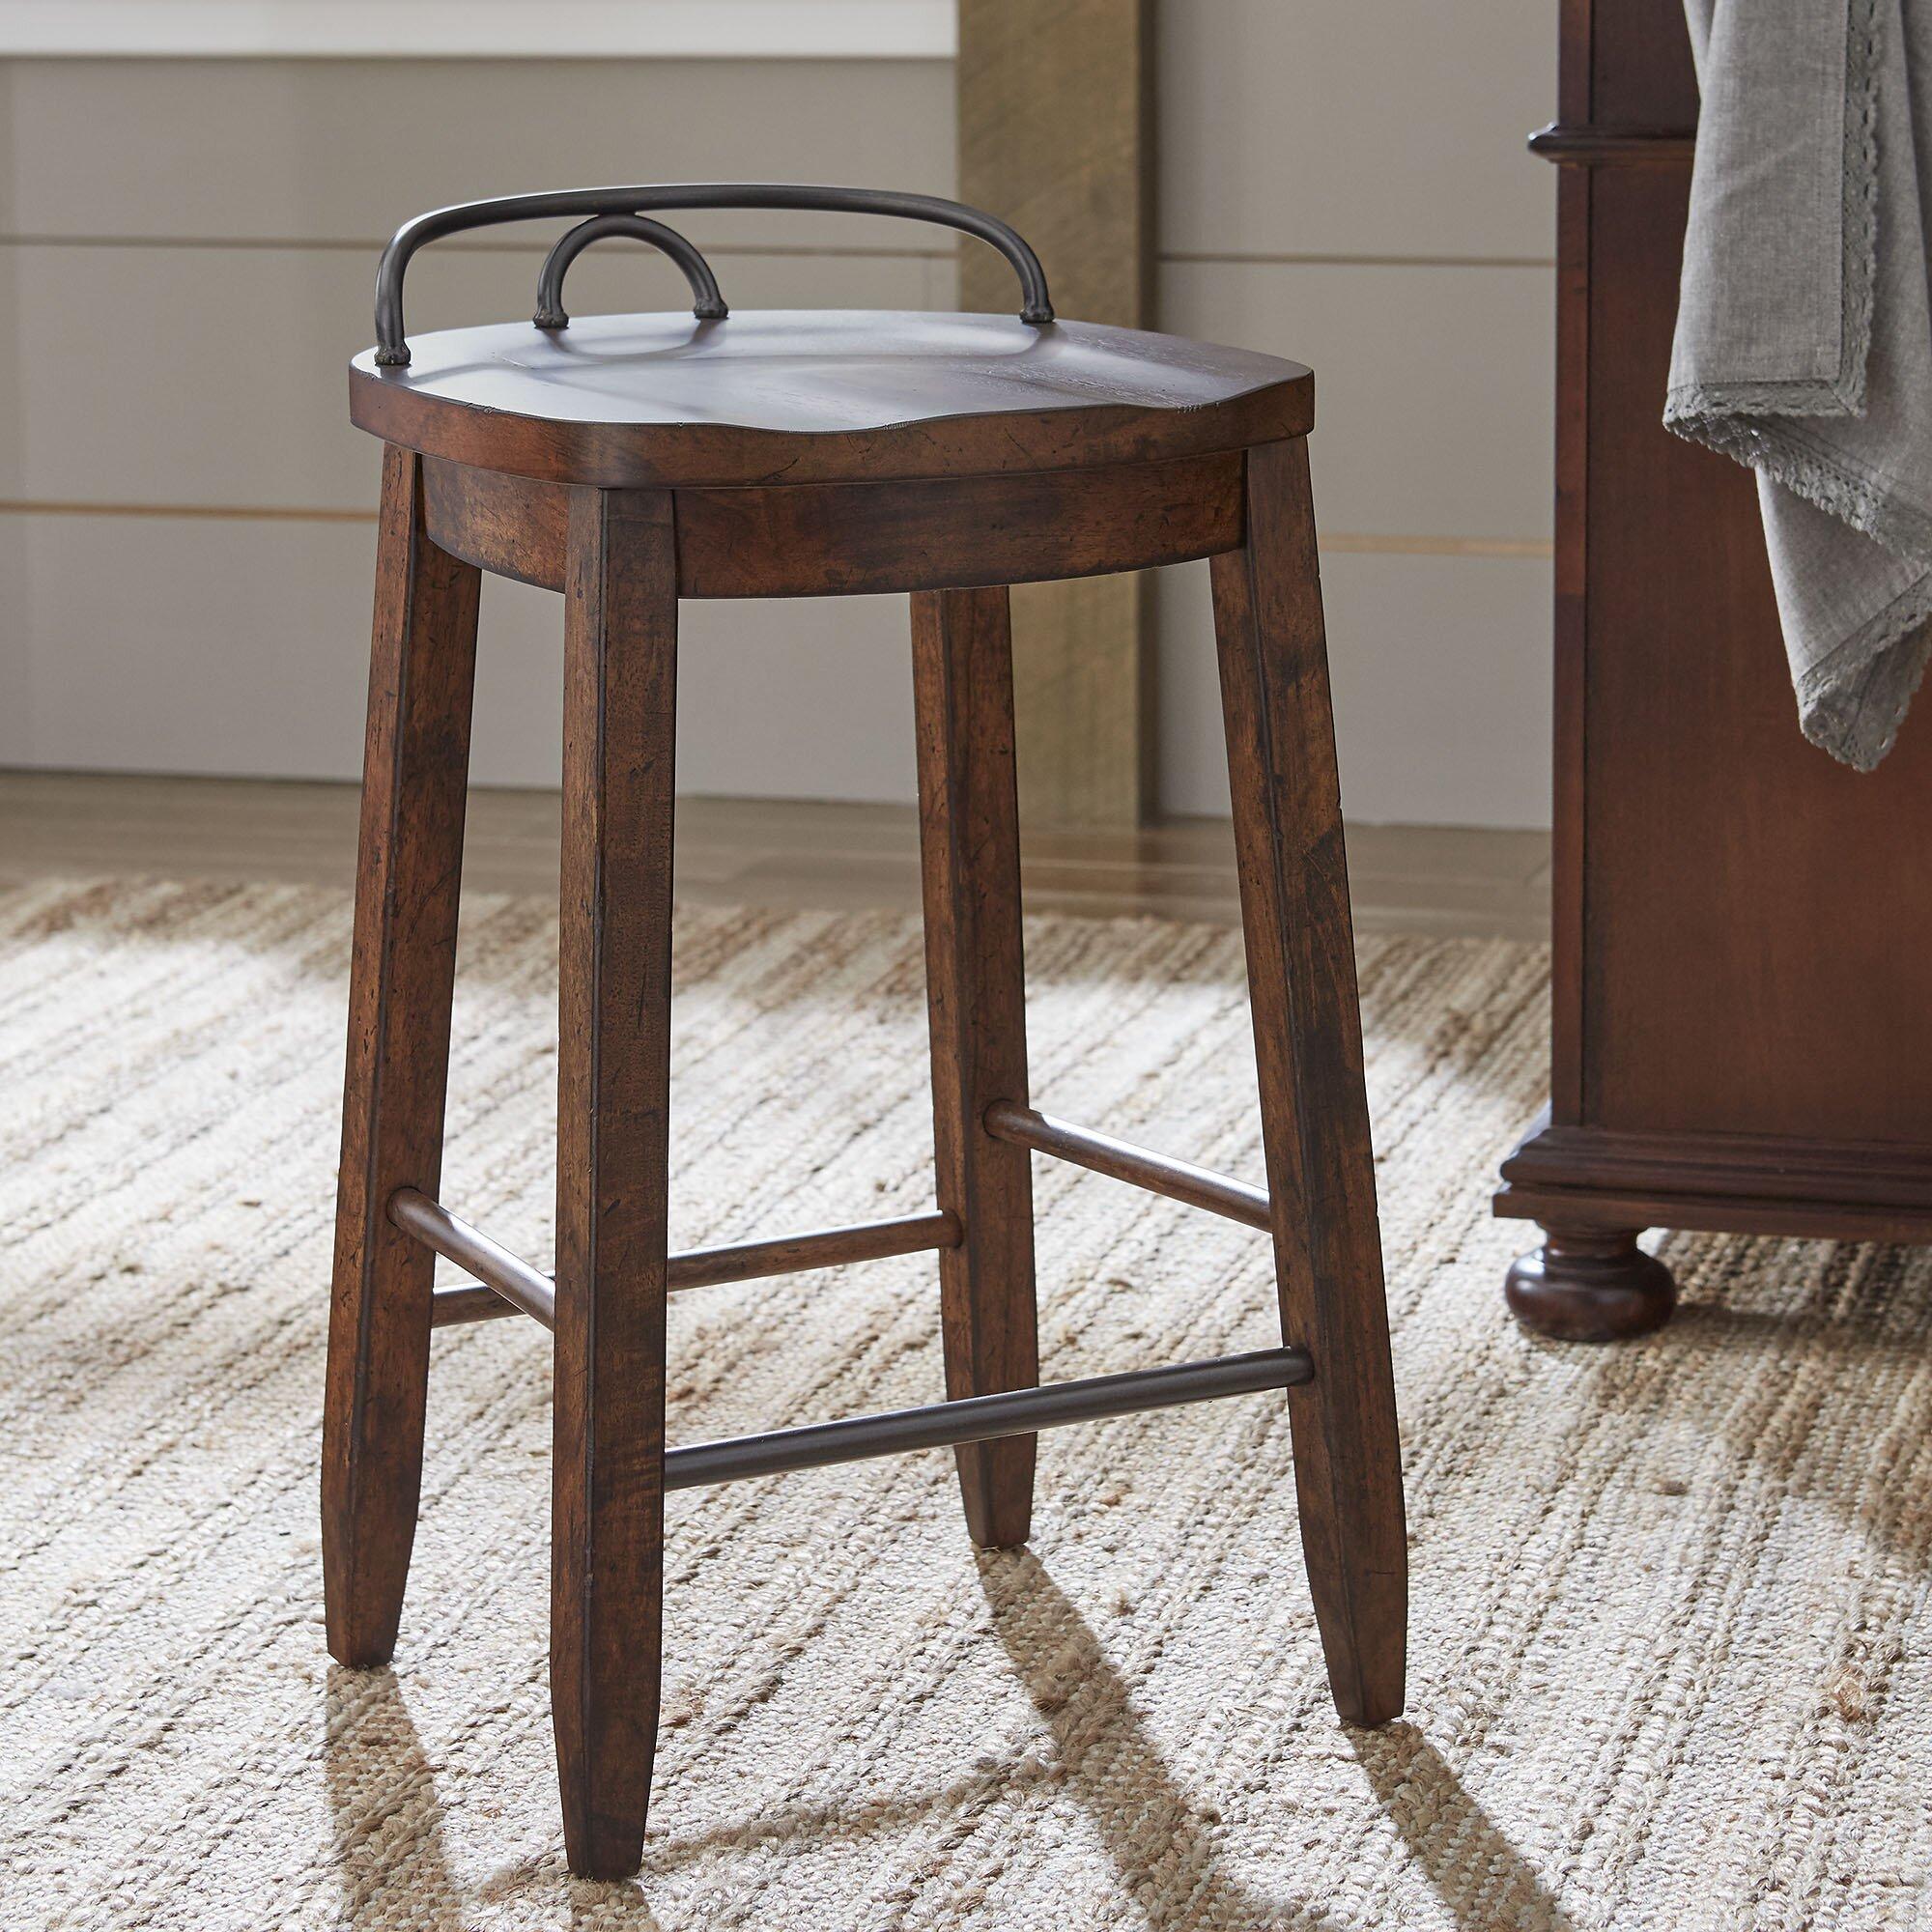 stress colored stool : Birch Lane Trade Piedmont Counter Height Stool